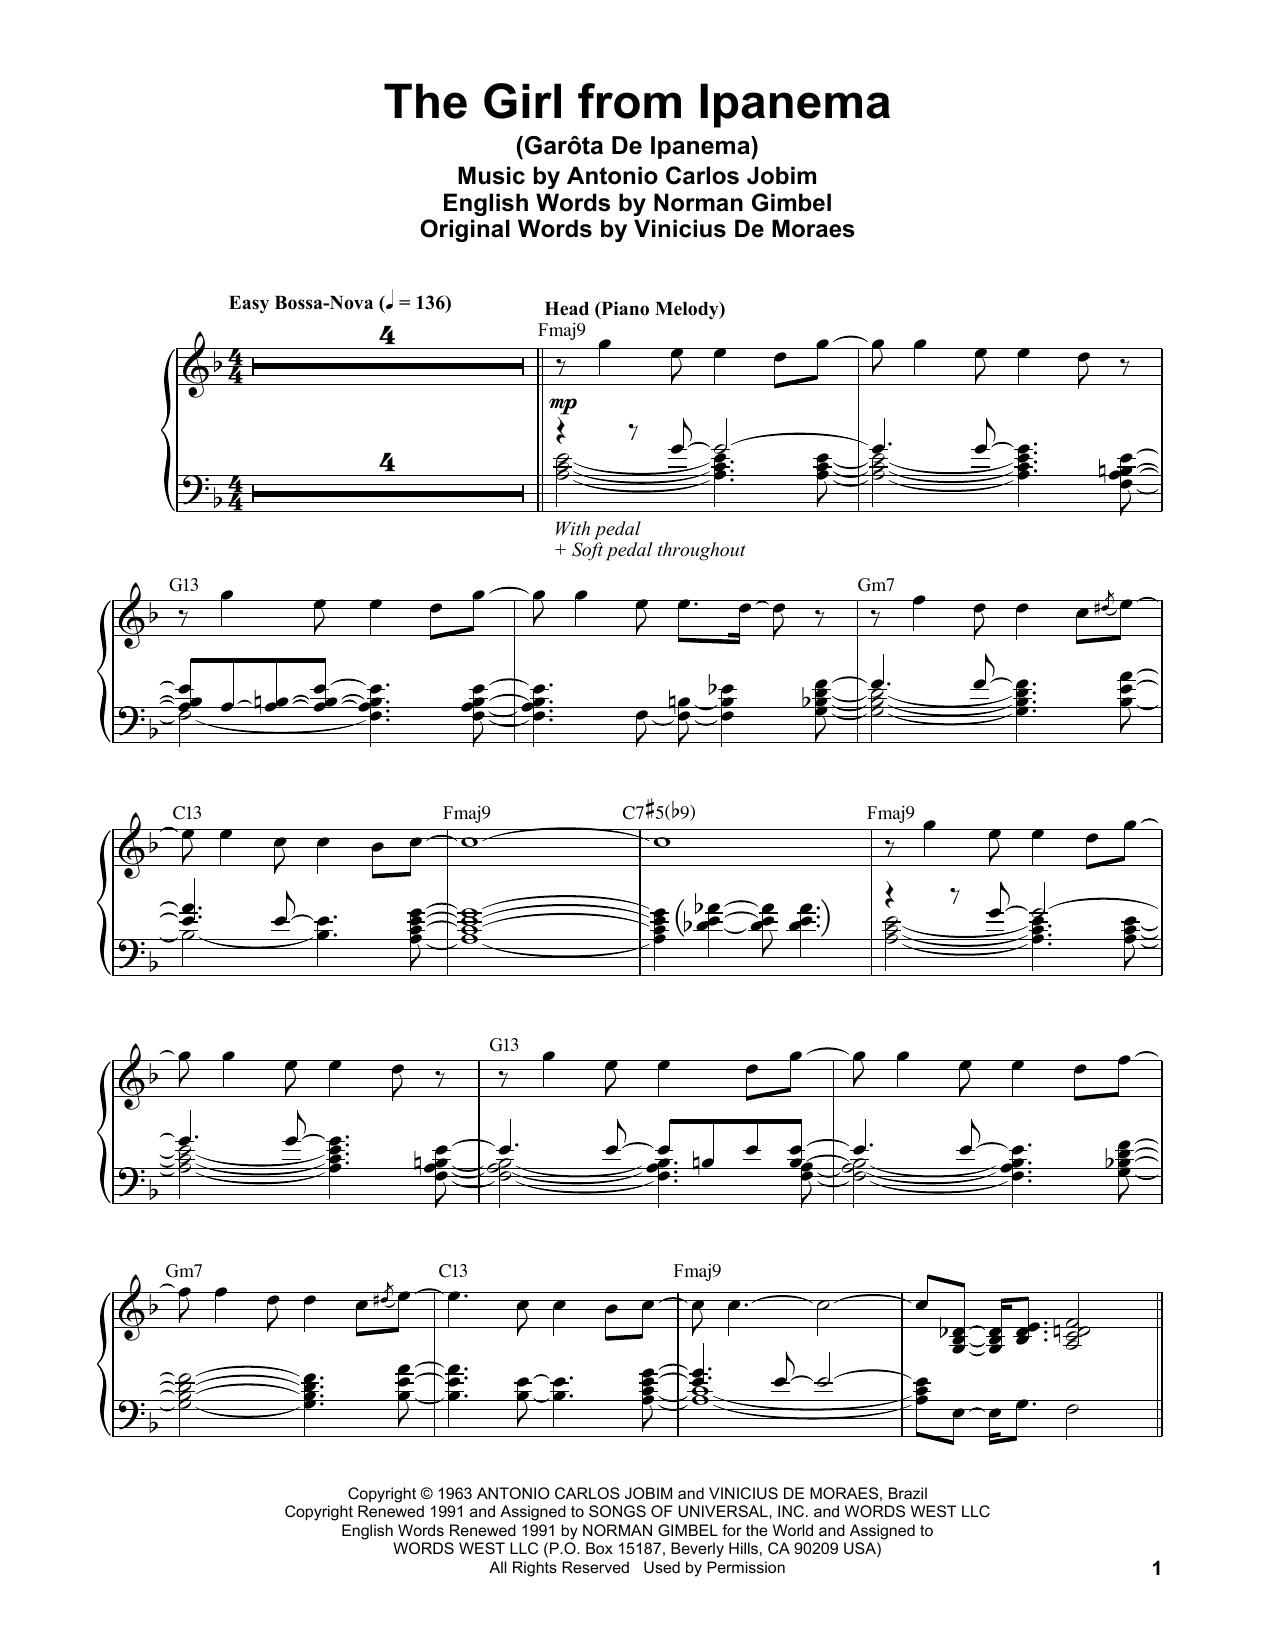 Vince Guaraldi The Girl From Ipanema (Garota De Ipanema) sheet music notes and chords. Download Printable PDF.